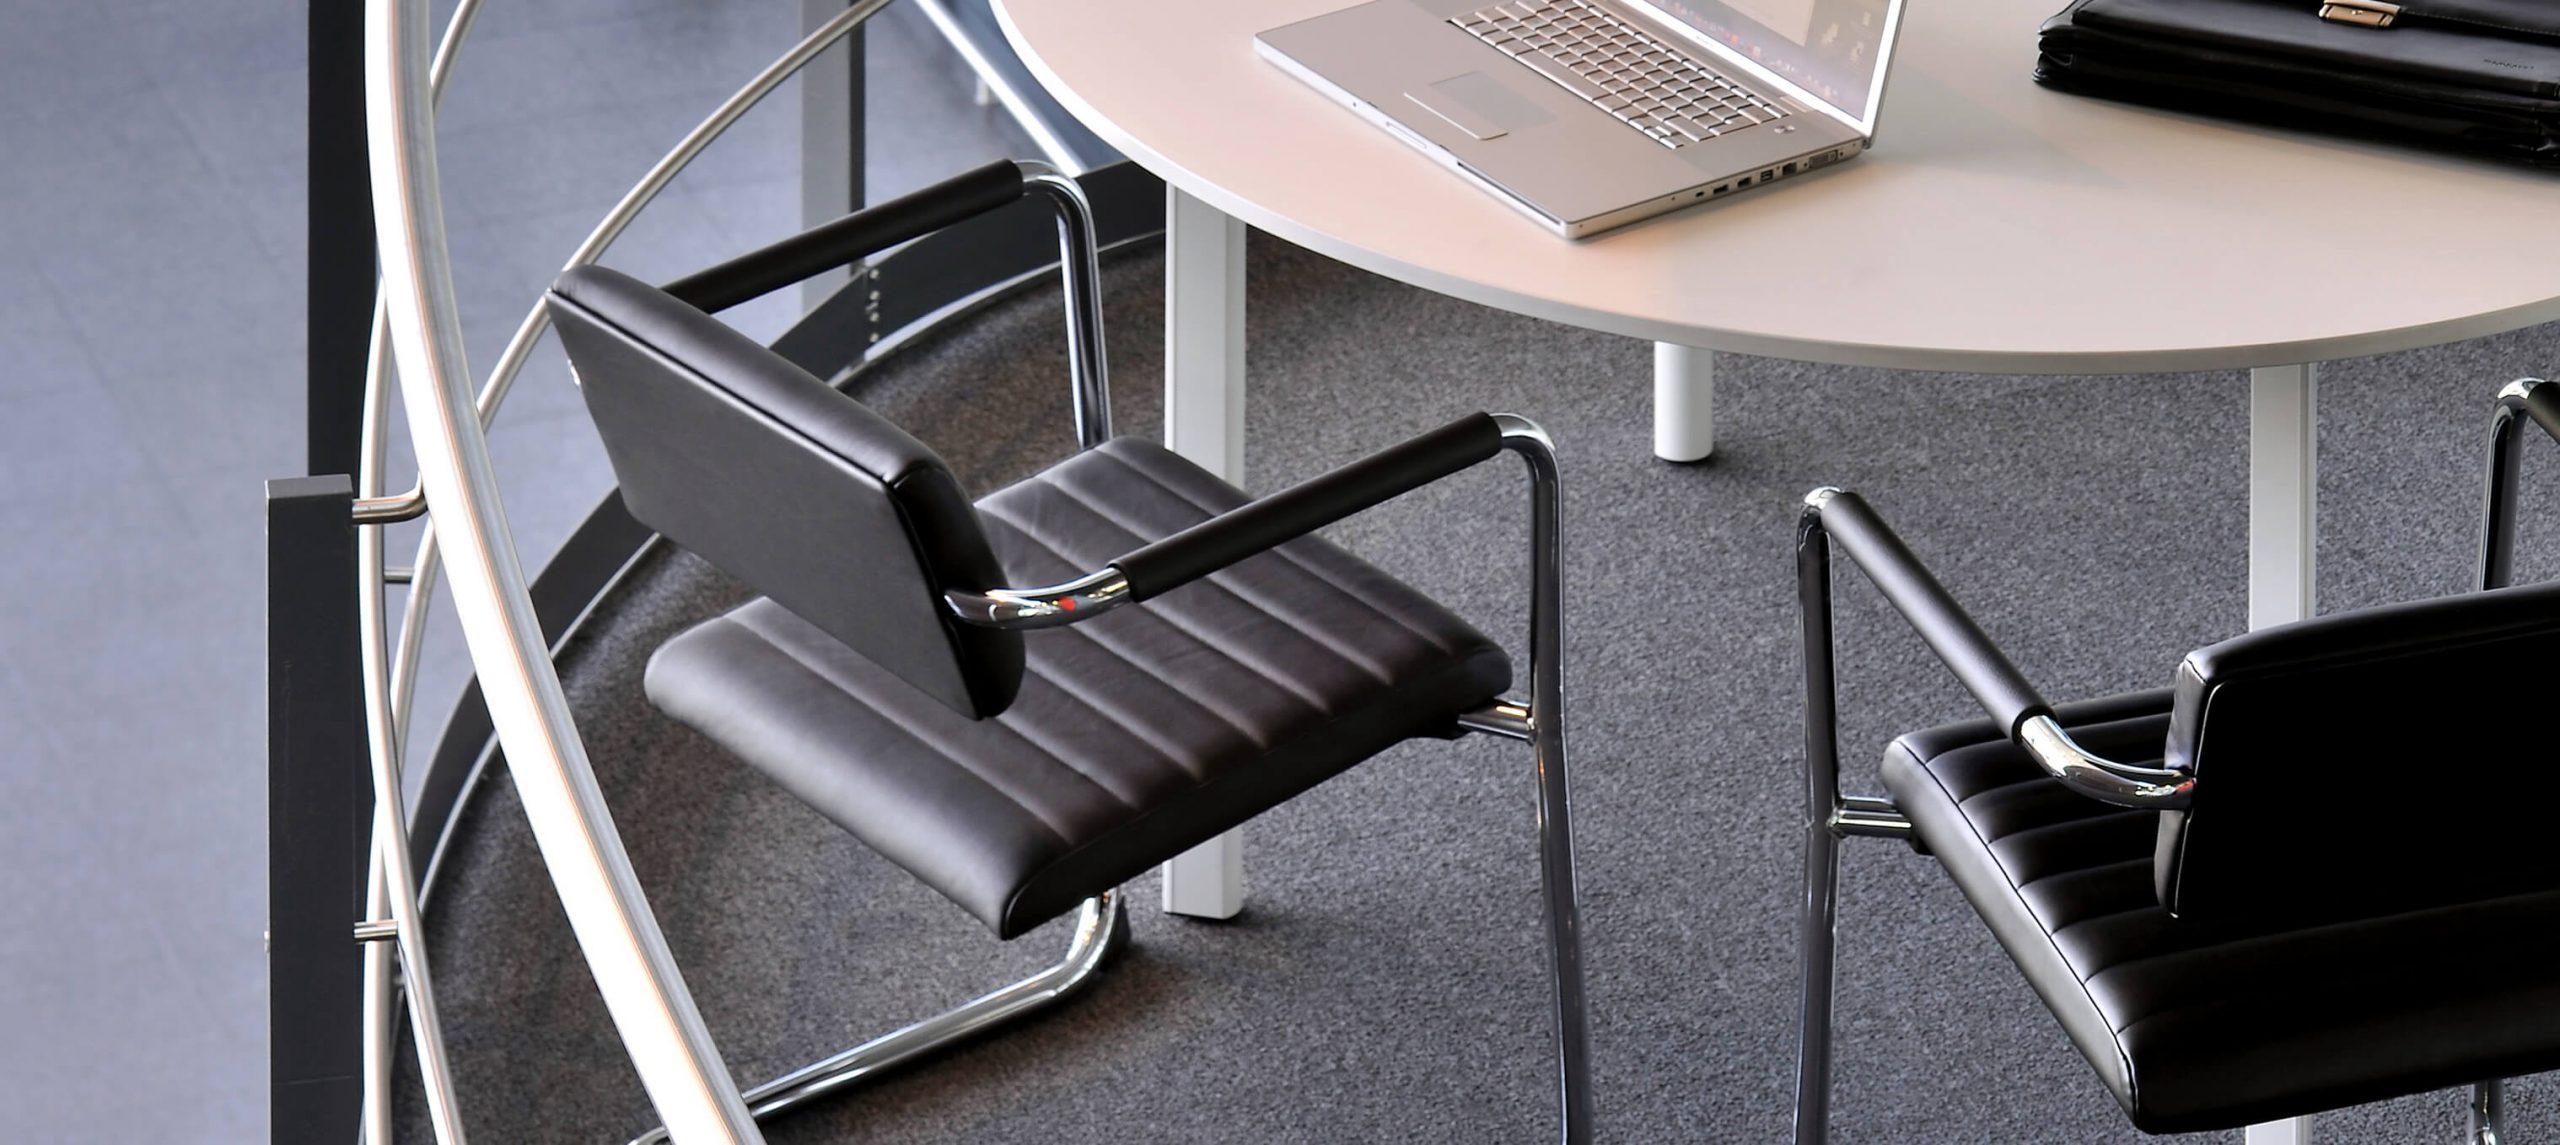 Tiani Office Chair - Hero